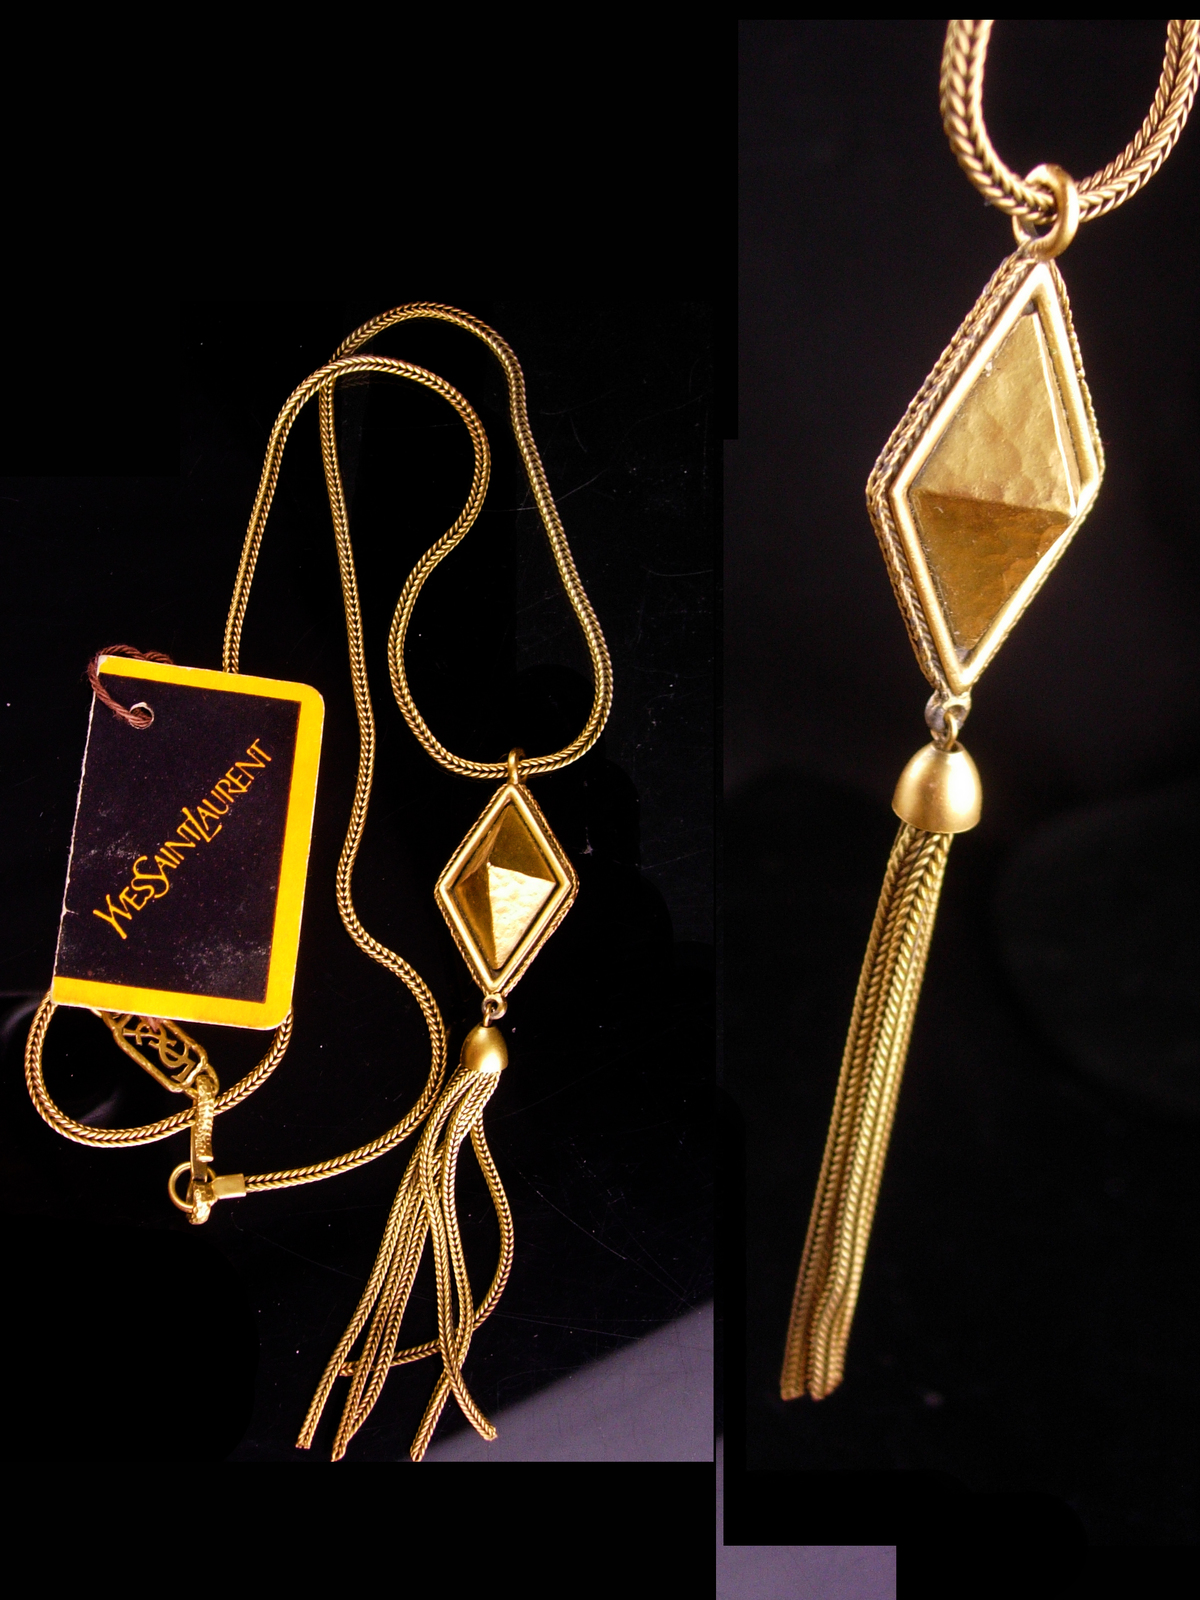 Vintage Yves Saint Laurent necklace - French necklace - original tag - YSL tasse